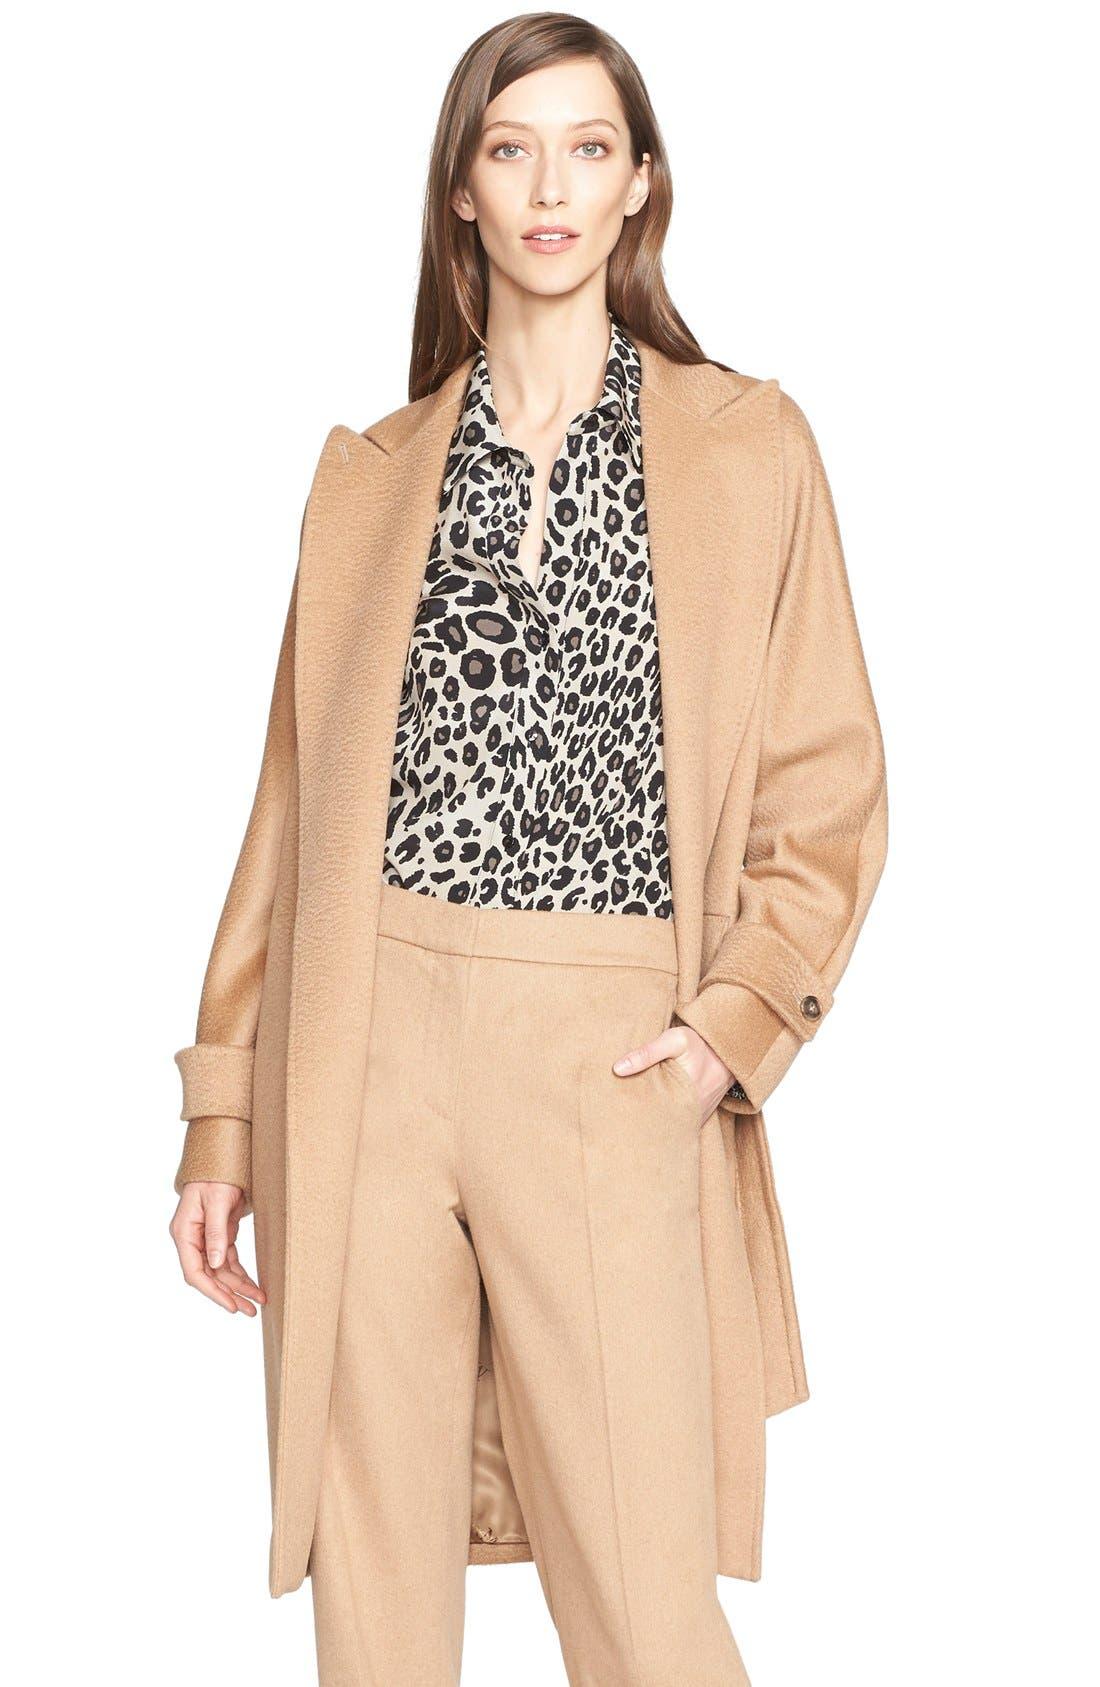 Alternate Image 1 Selected - Max Mara 'Megaton' Camel Hair Wrap Coat